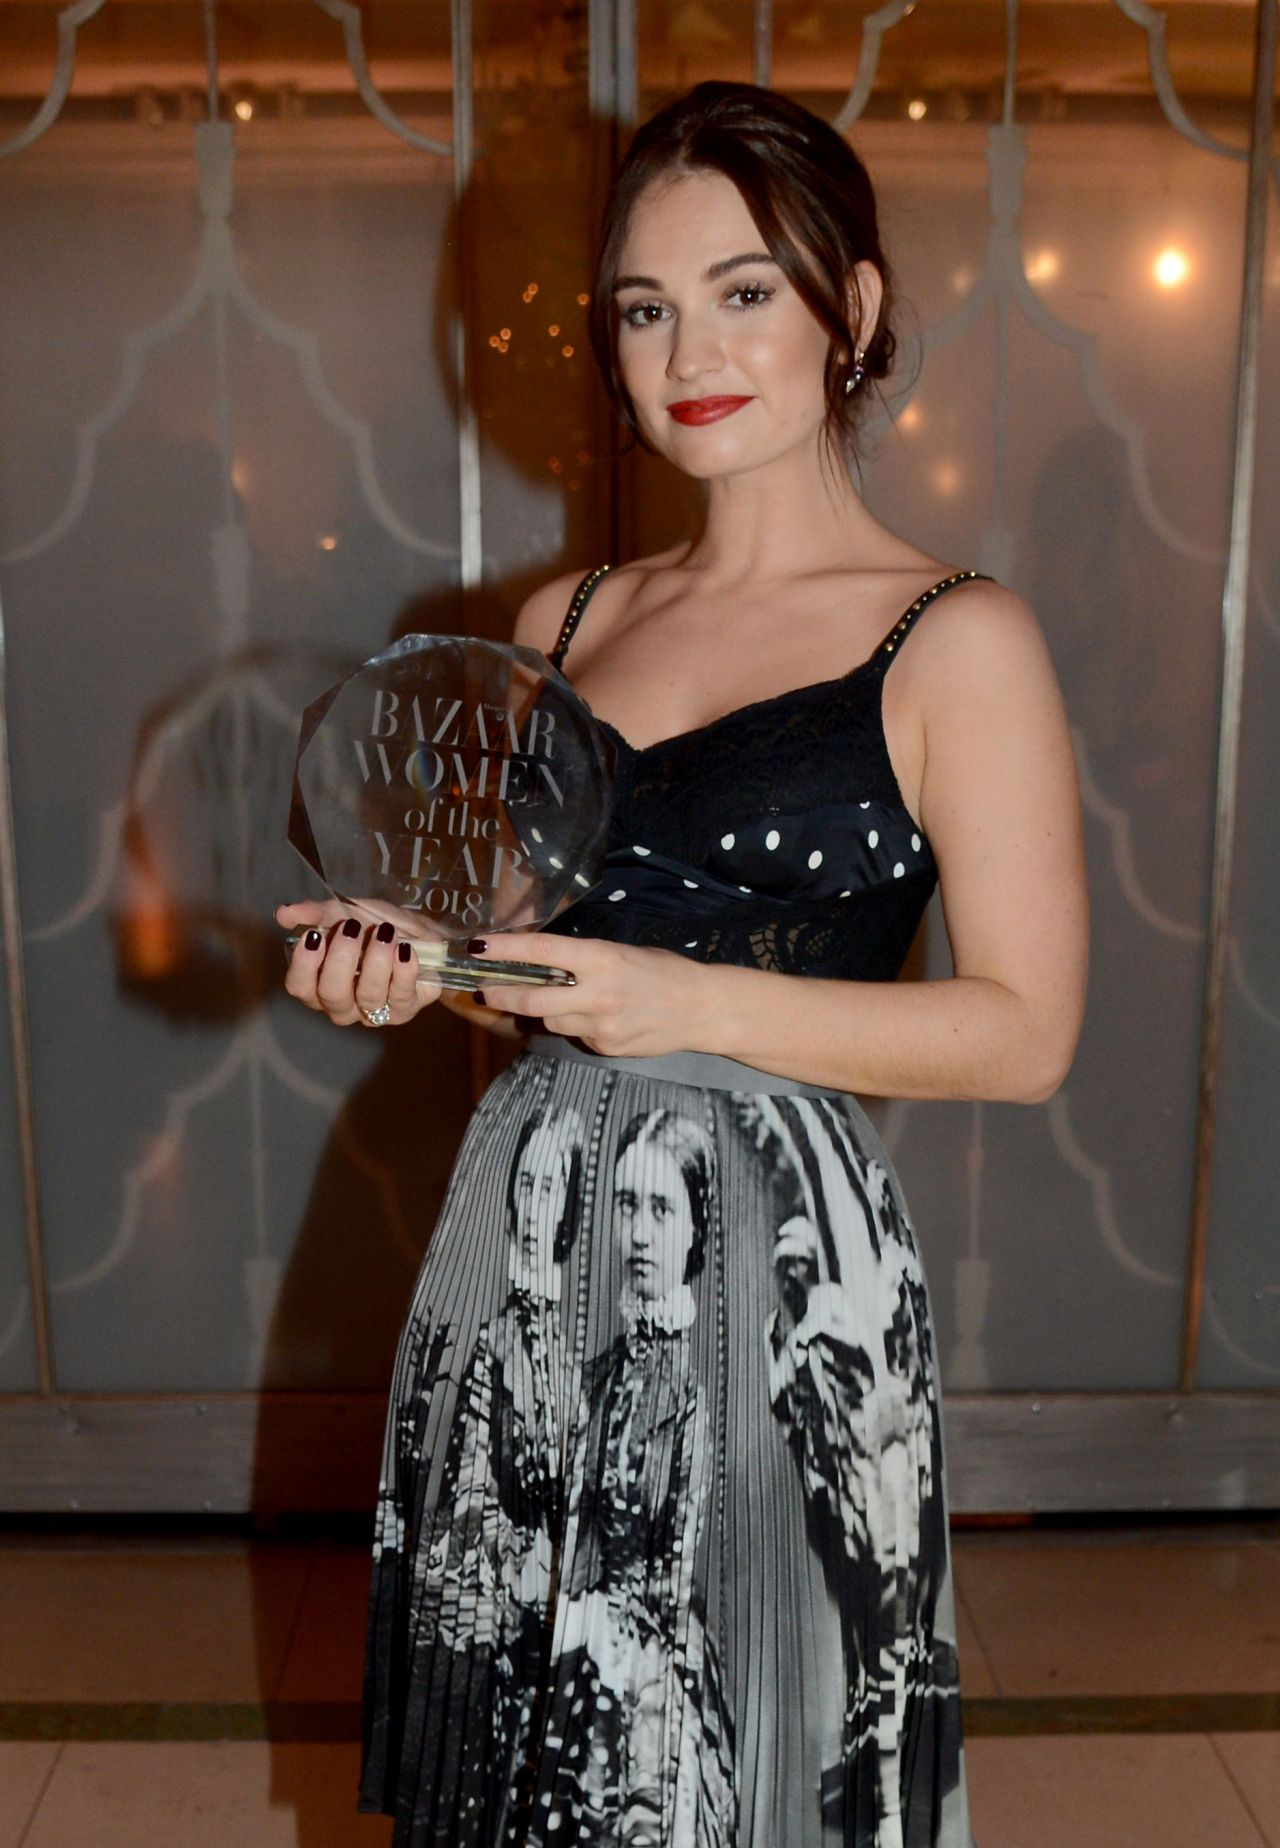 https://celebmafia.com/wp-content/uploads/2018/10/lily-james-harper-s-bazaar-women-of-the-year-awards-2018-2.jpg